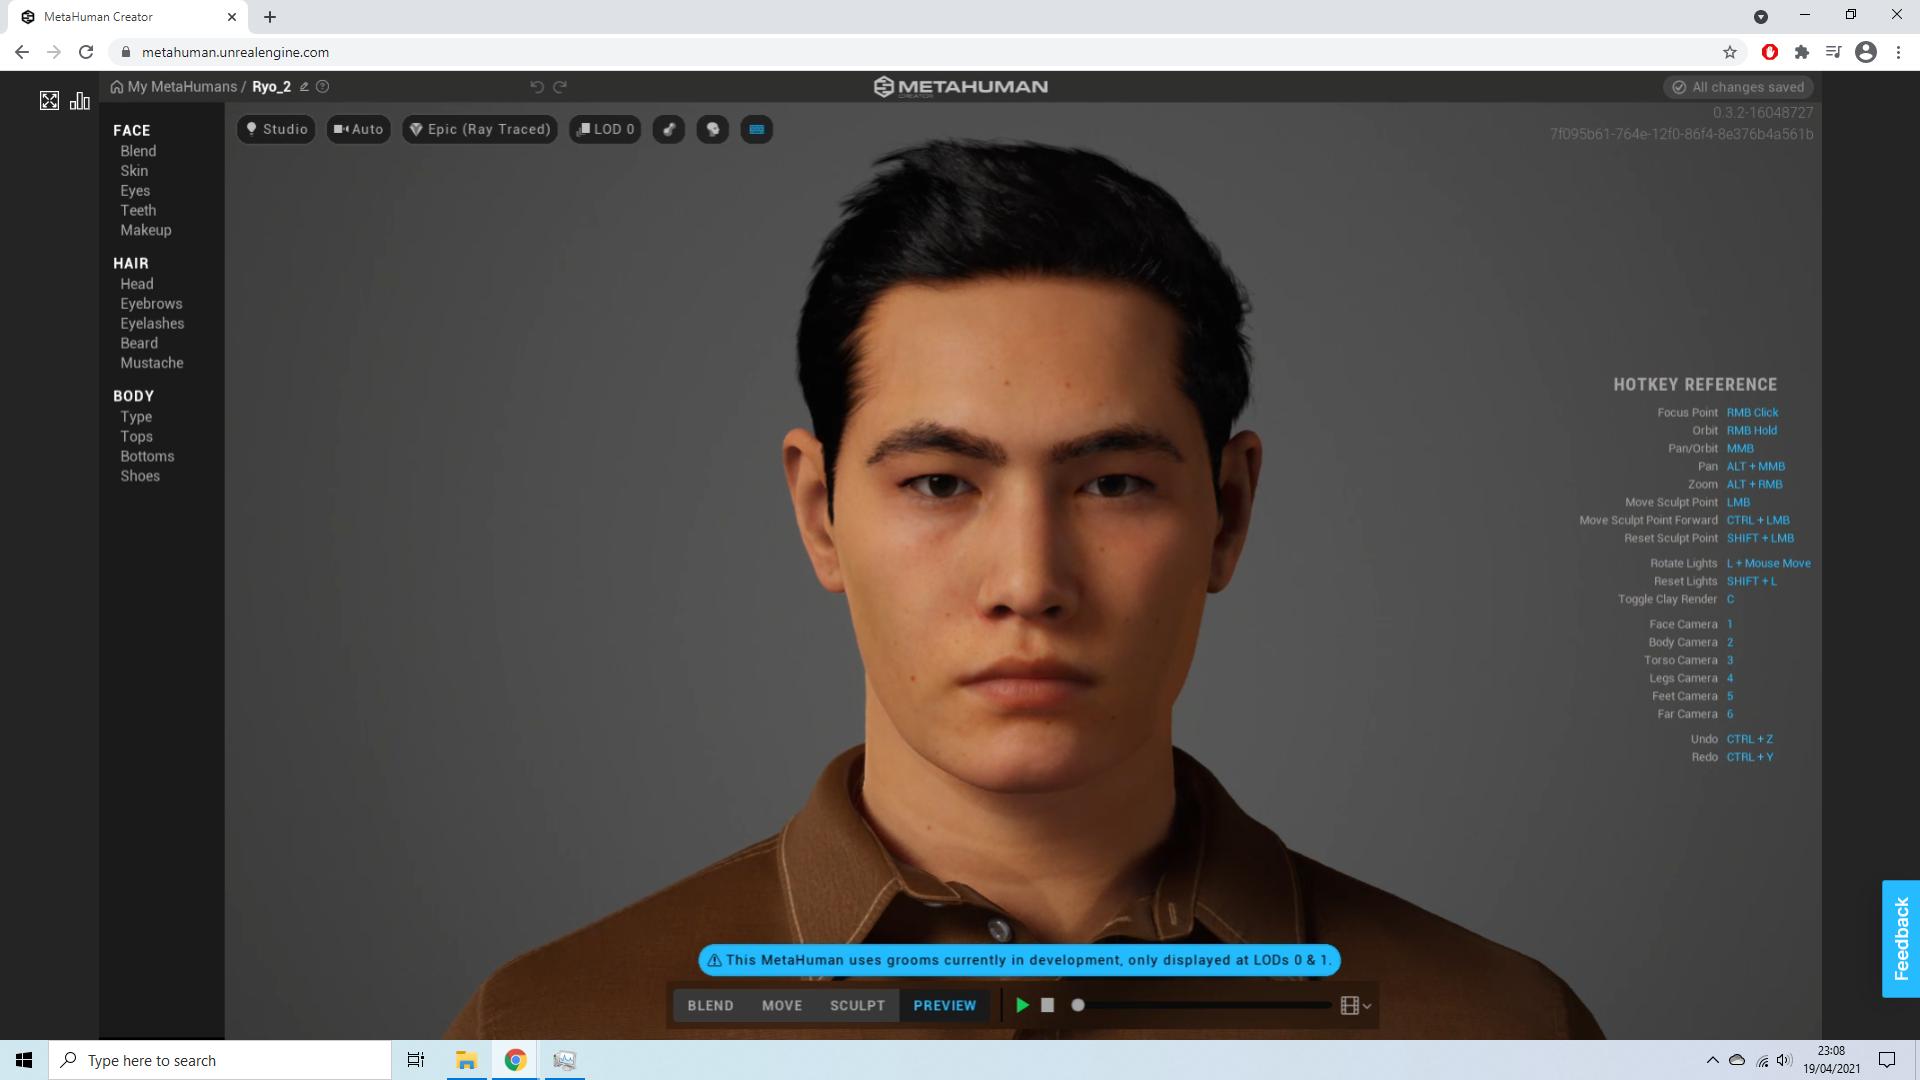 desktopscreenshot2021rbj3q.png